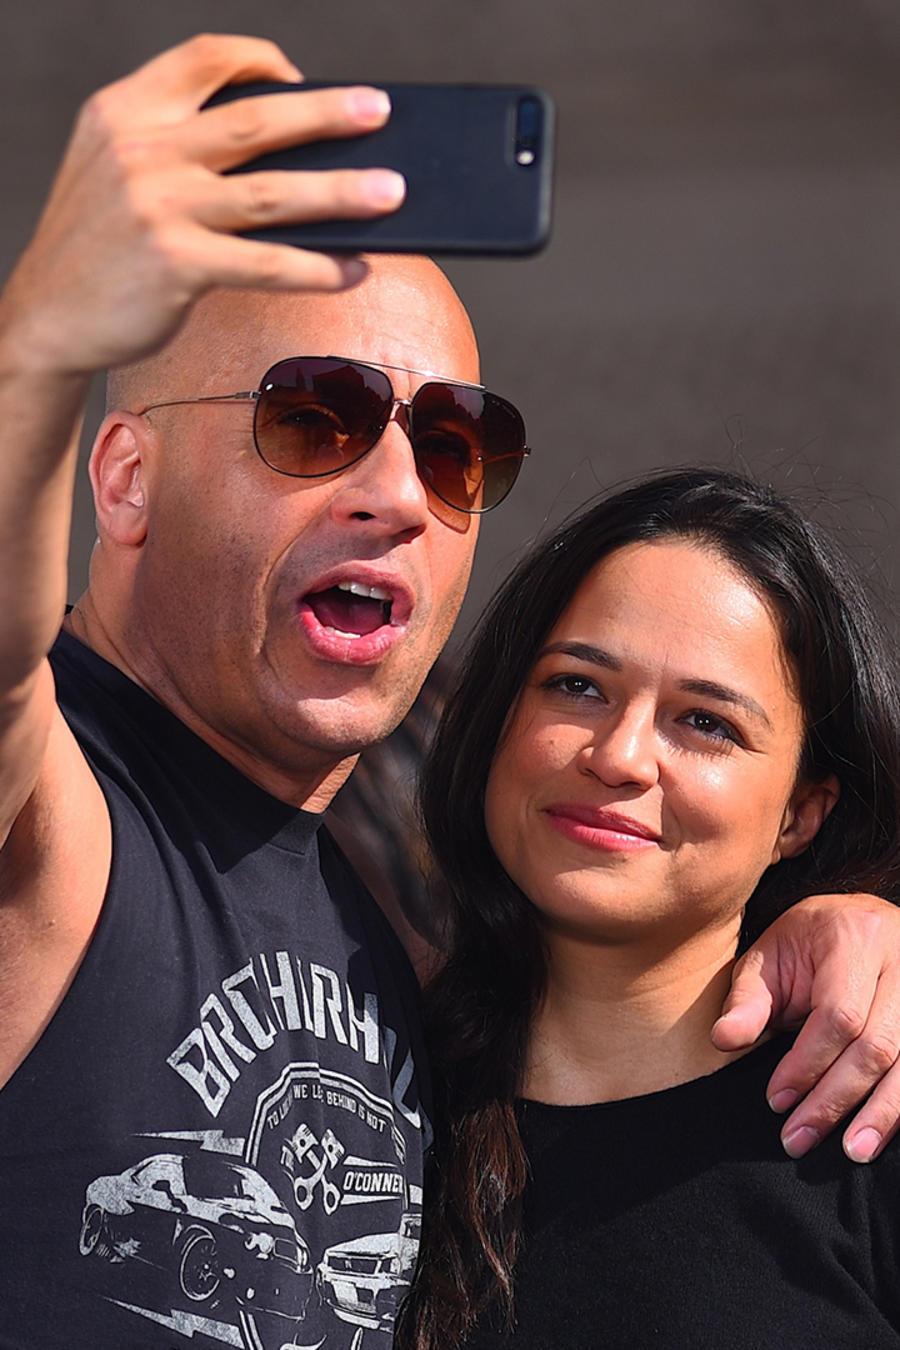 Michelle Rodriguez and Vin Diesel taking a selfie